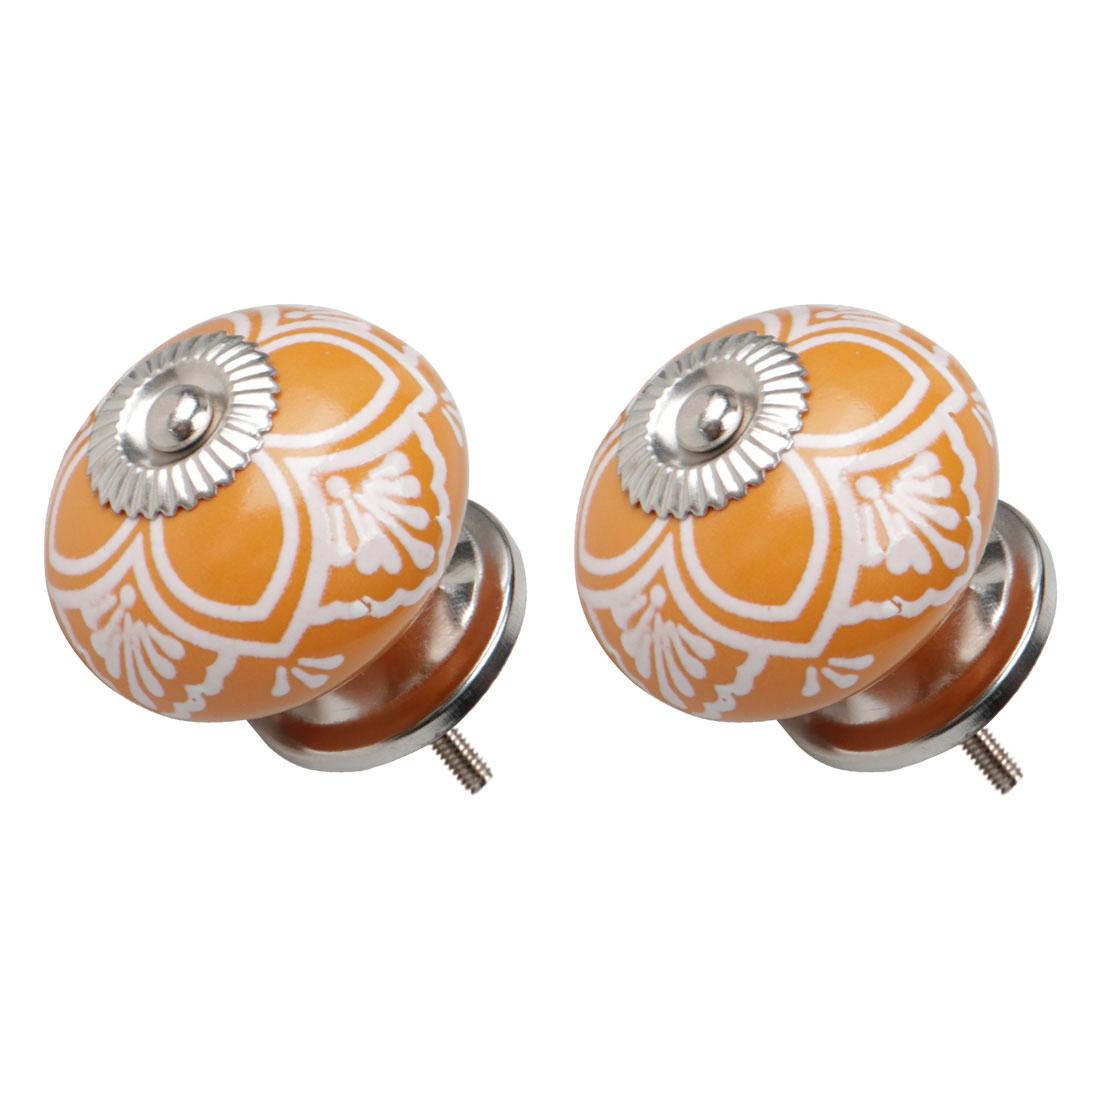 Ceramic Vintage Knob Drawers Round Pull Handle Cabinet Wardrobe Door 2pcs Yellow